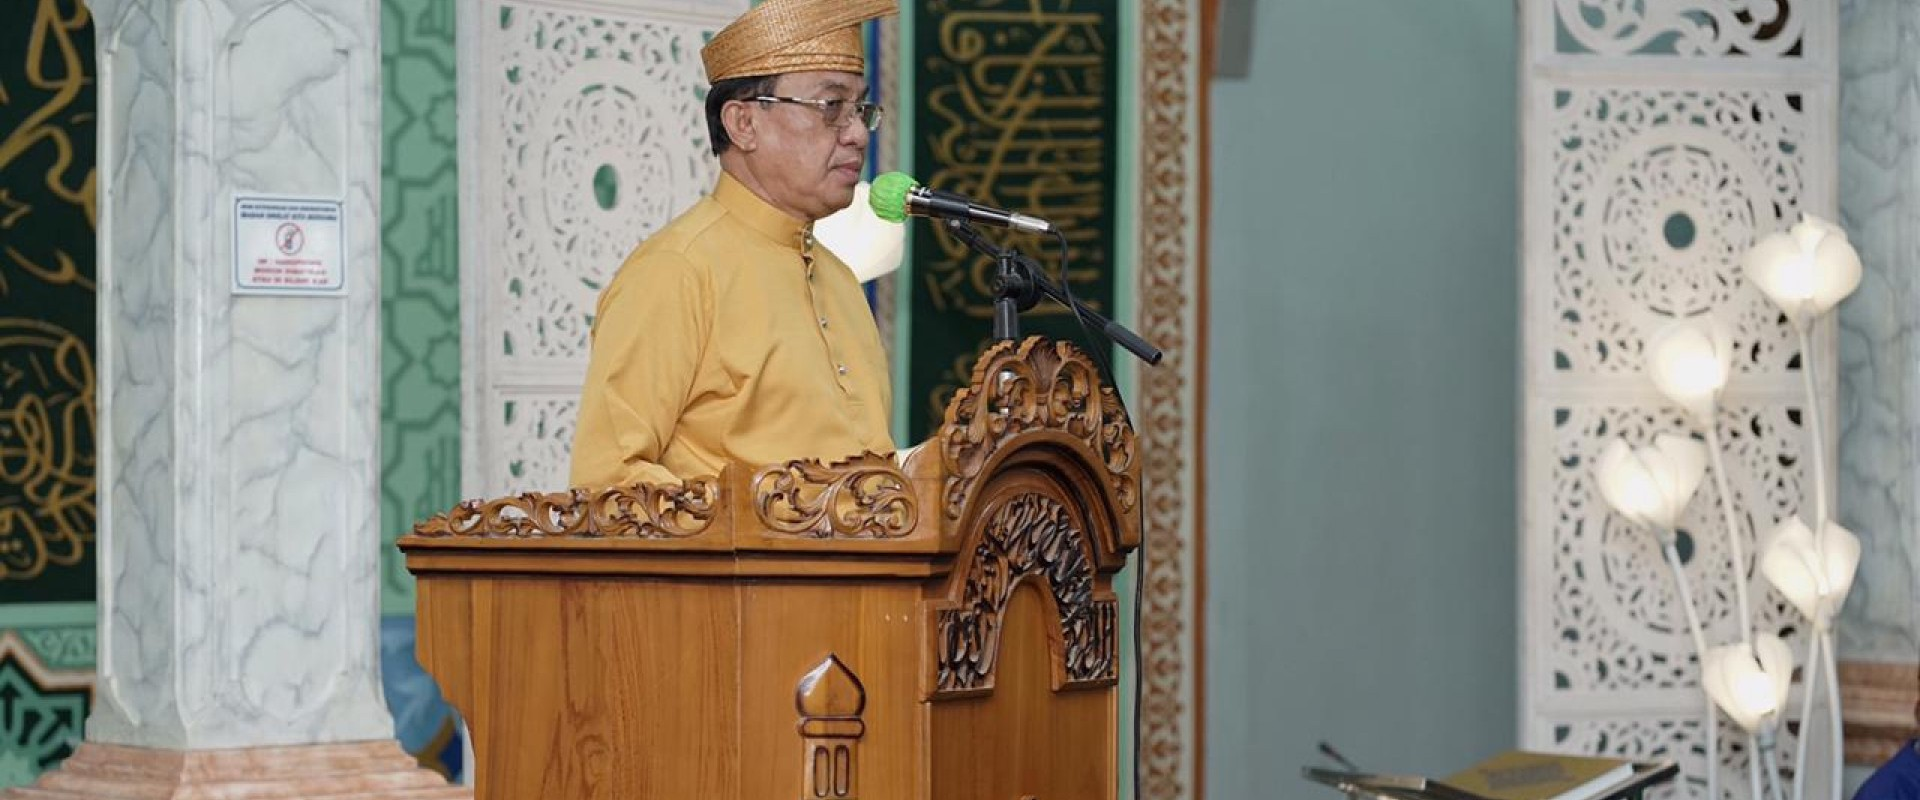 STQ Tingkat Kecamatan Tembilahan Secara Resmi Di Buka Bupati Inhil HM.Wardan